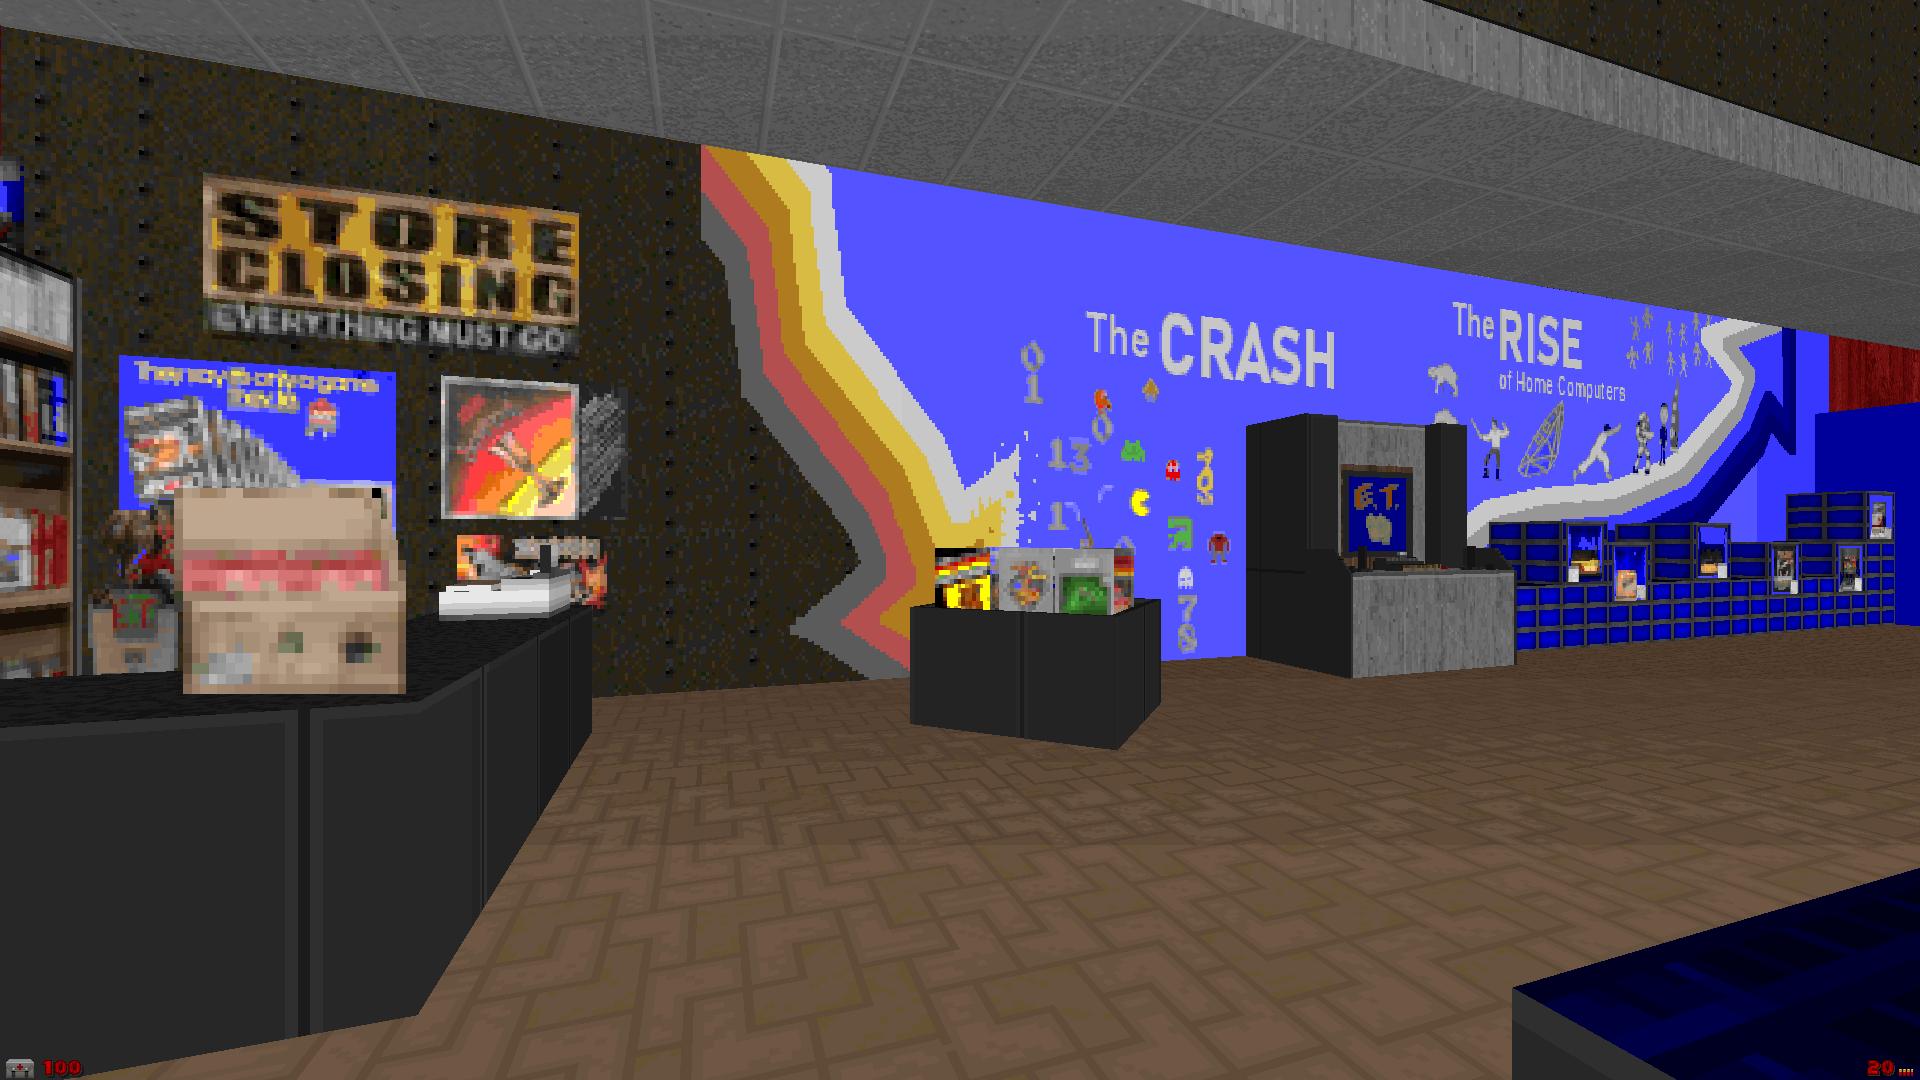 Screenshot_Doom_20200730_114926.png.0978e4a4fd005d806b3f907c6d38250c.png